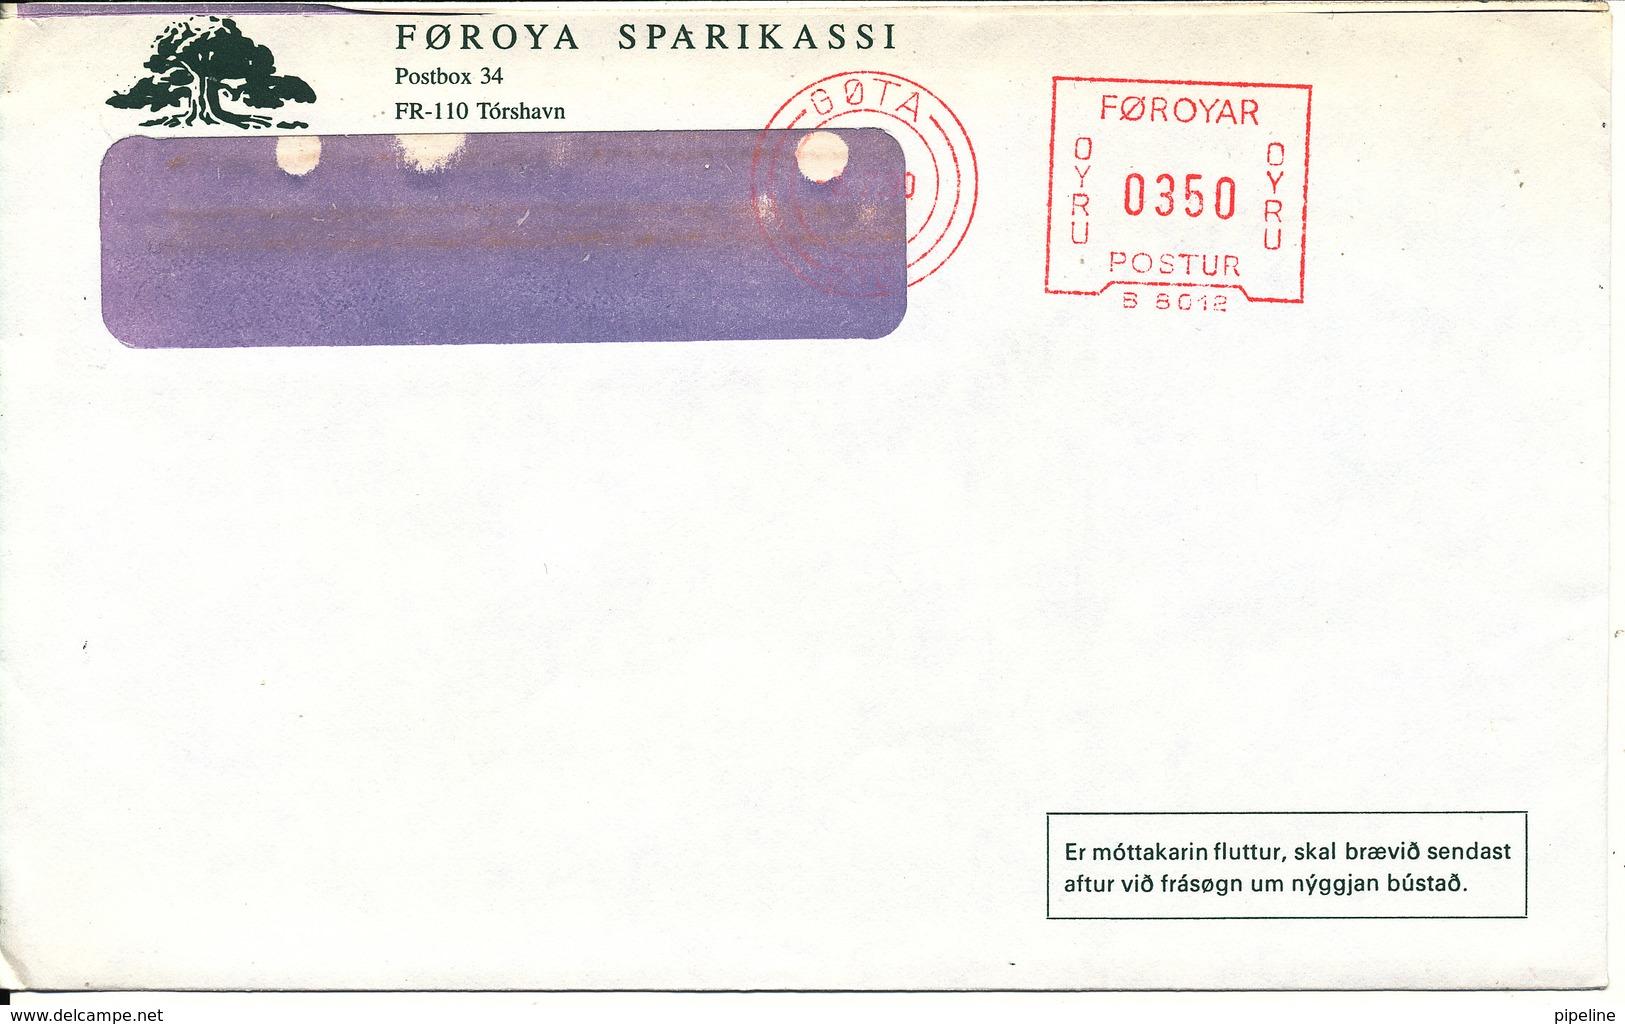 Faroe Islands Bank Cover With Meter Cancel Göta 5-7-1990 (Föroya Sparikassi) - Faroe Islands